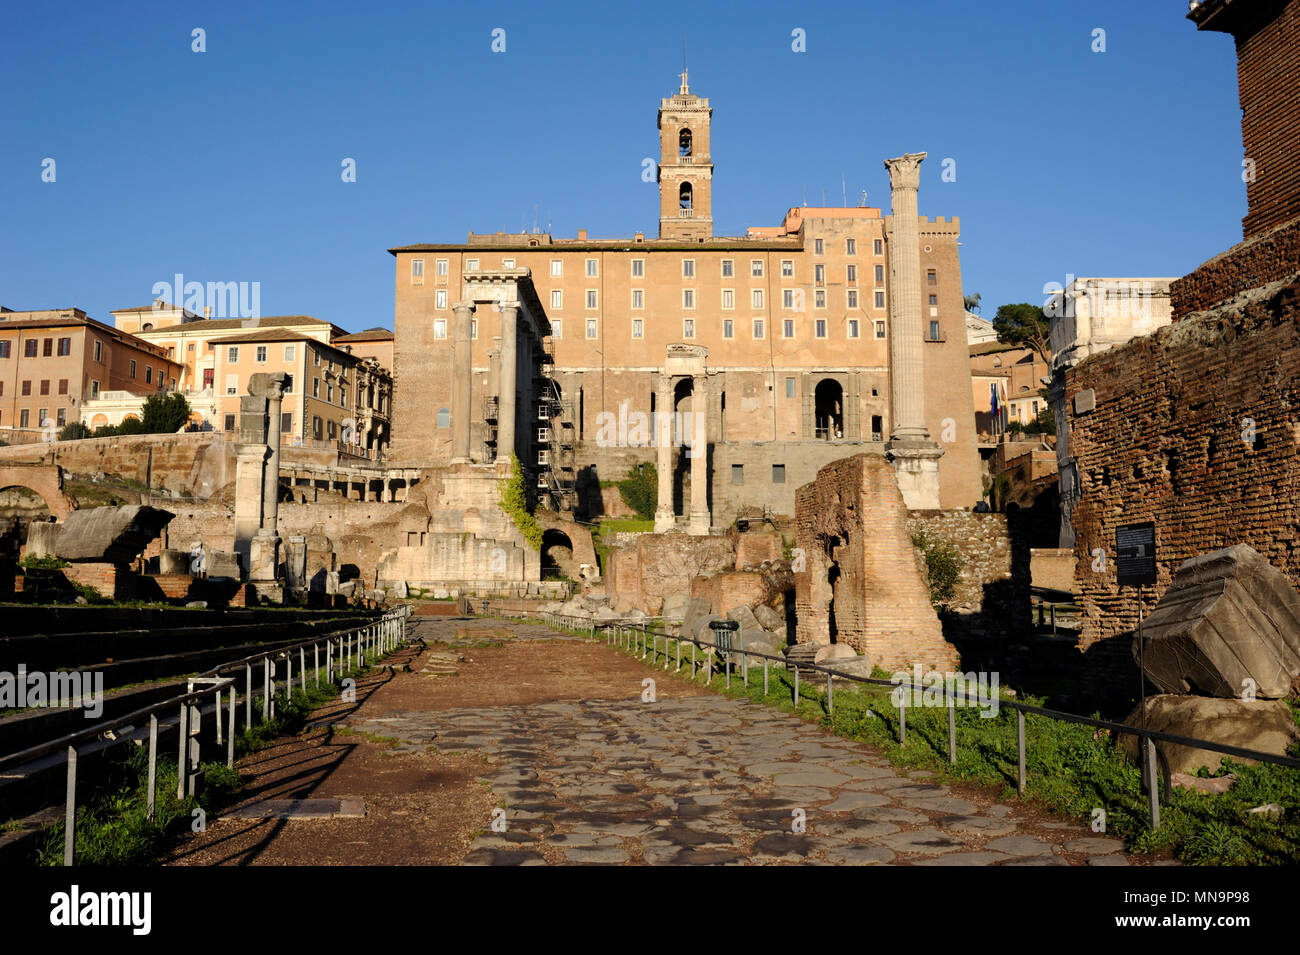 italy, rome, roman forum, via sacra street - Stock Image